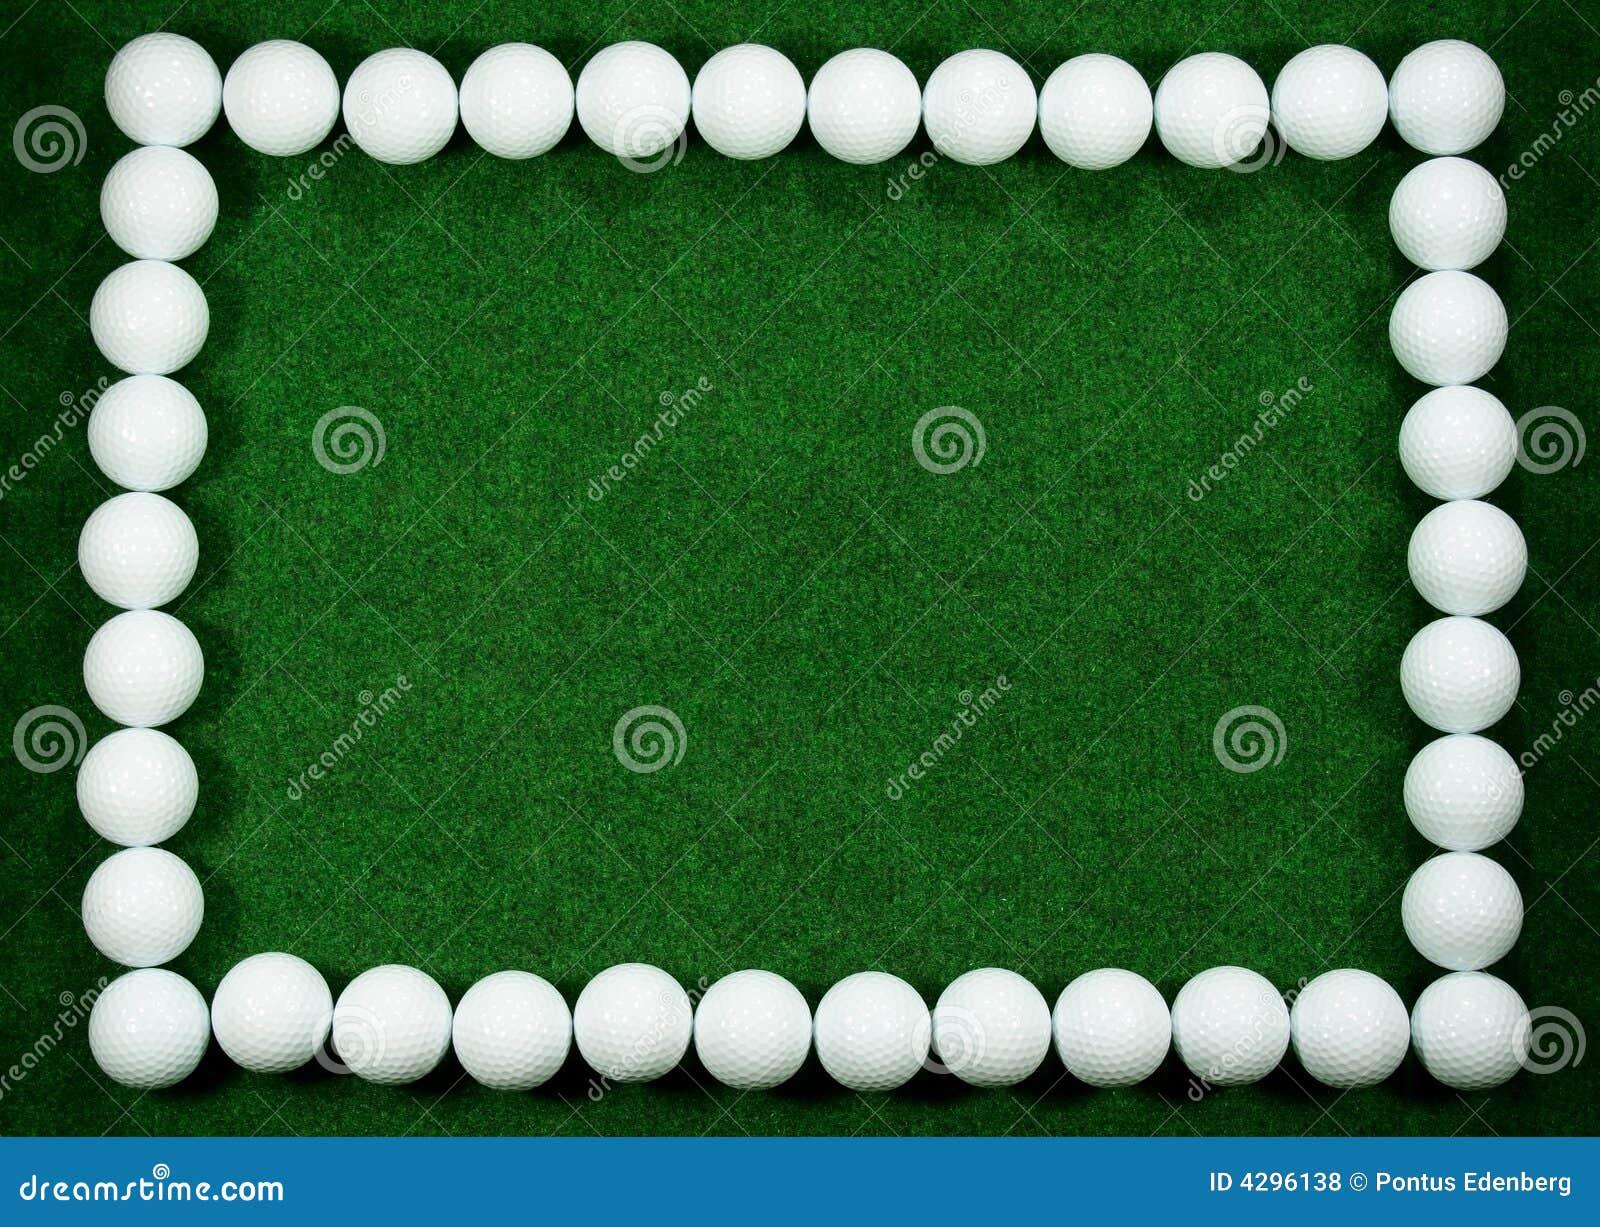 golf ball border clip art - photo #48